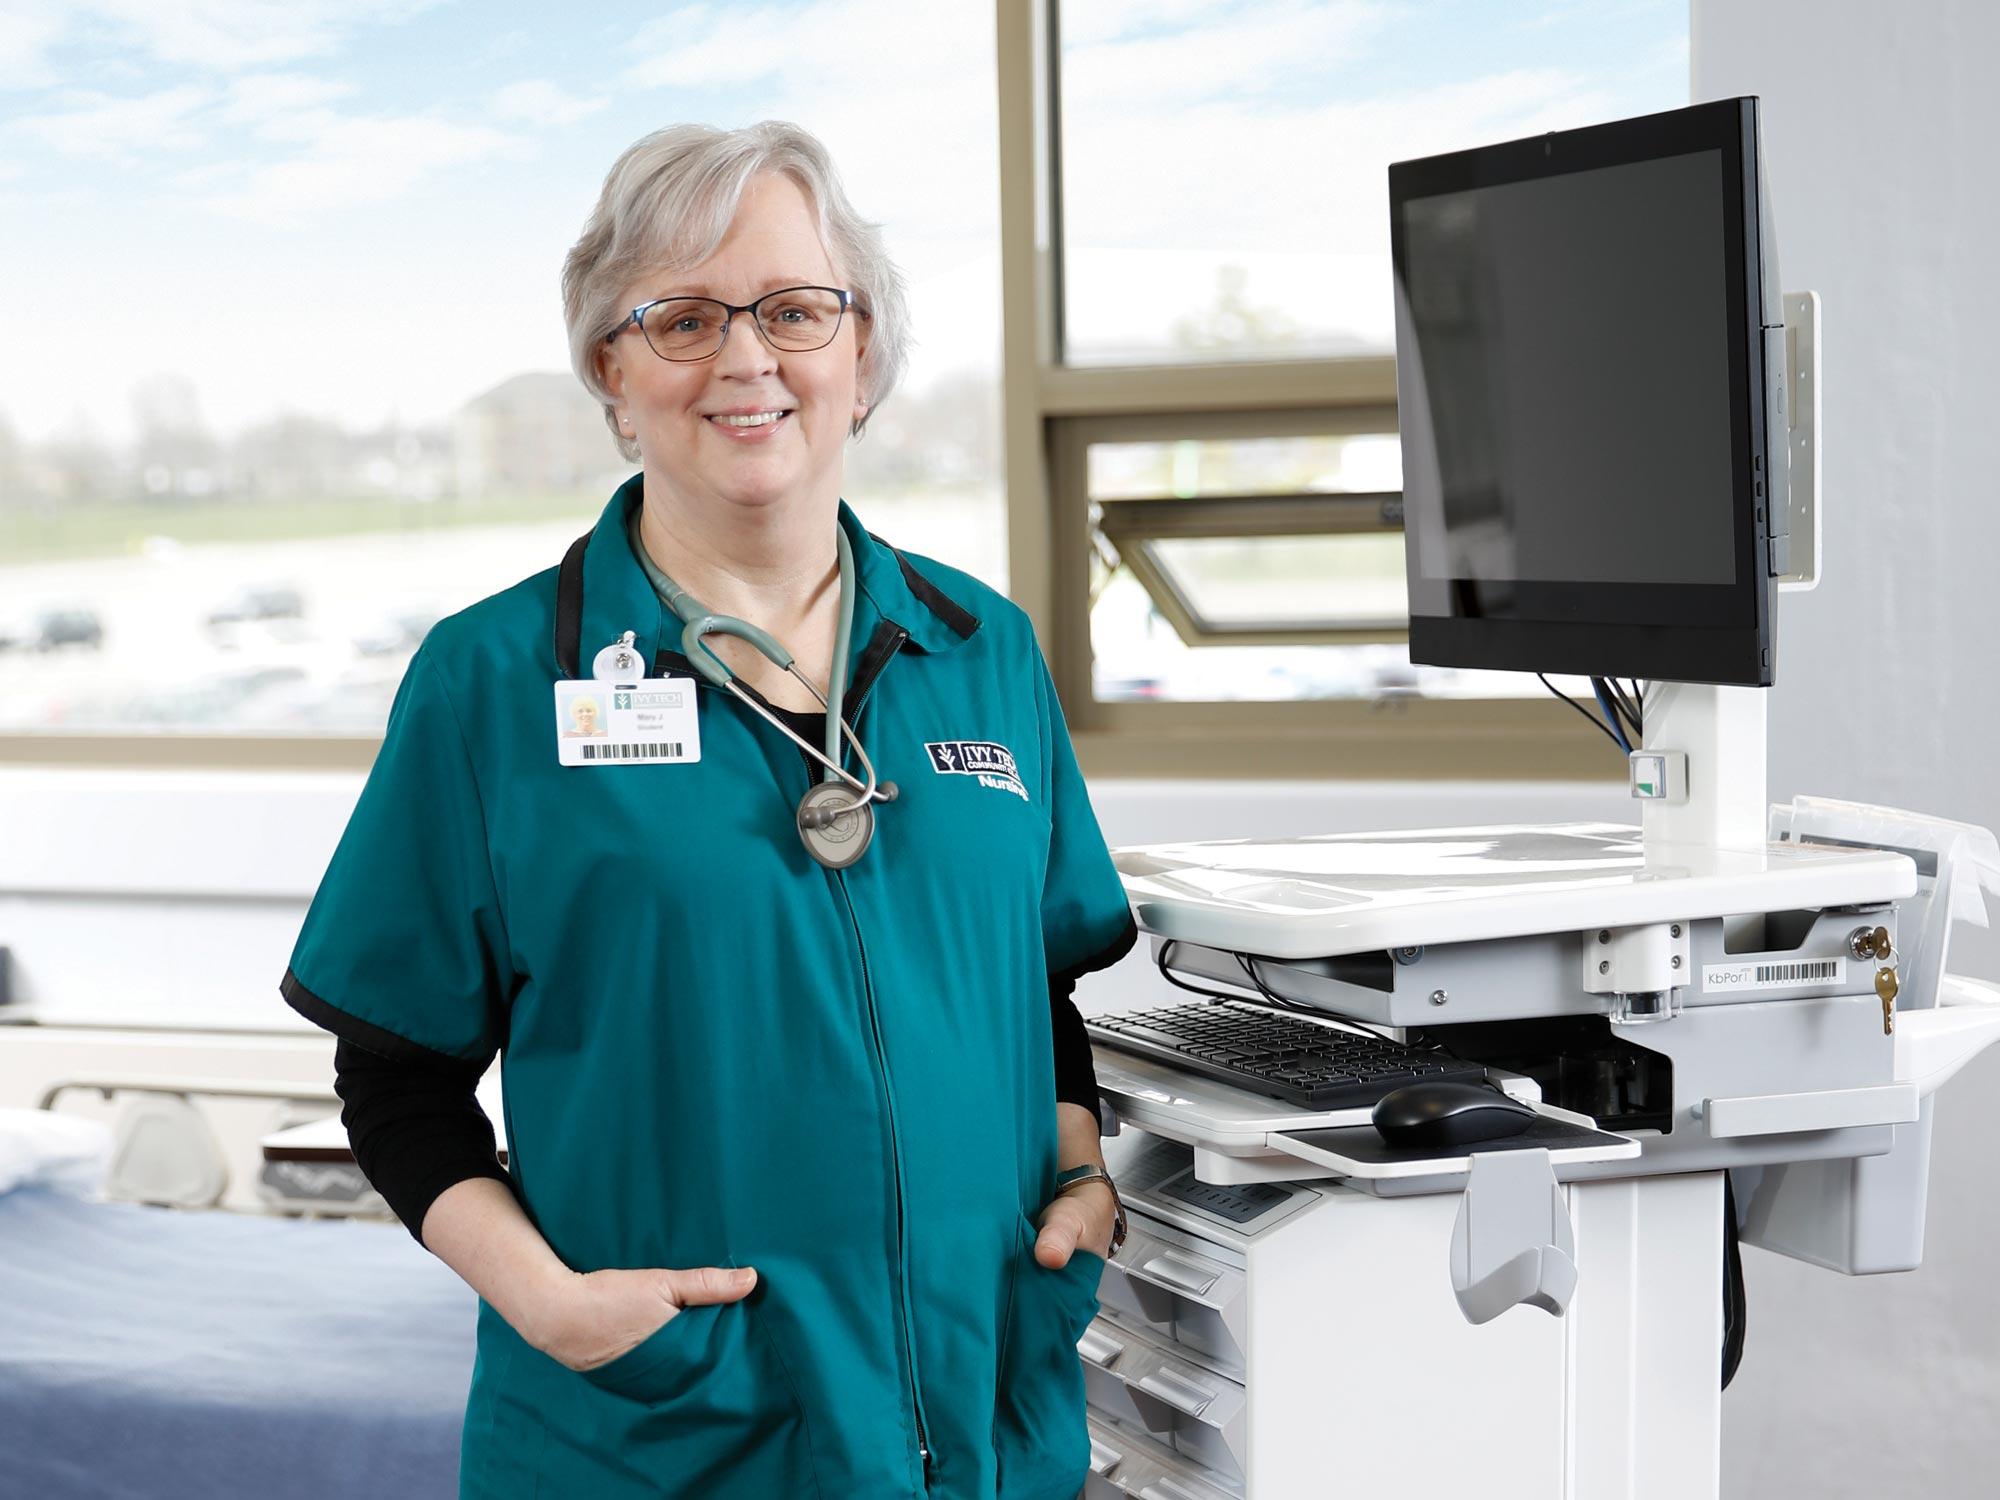 Older female student standing at nurse's station